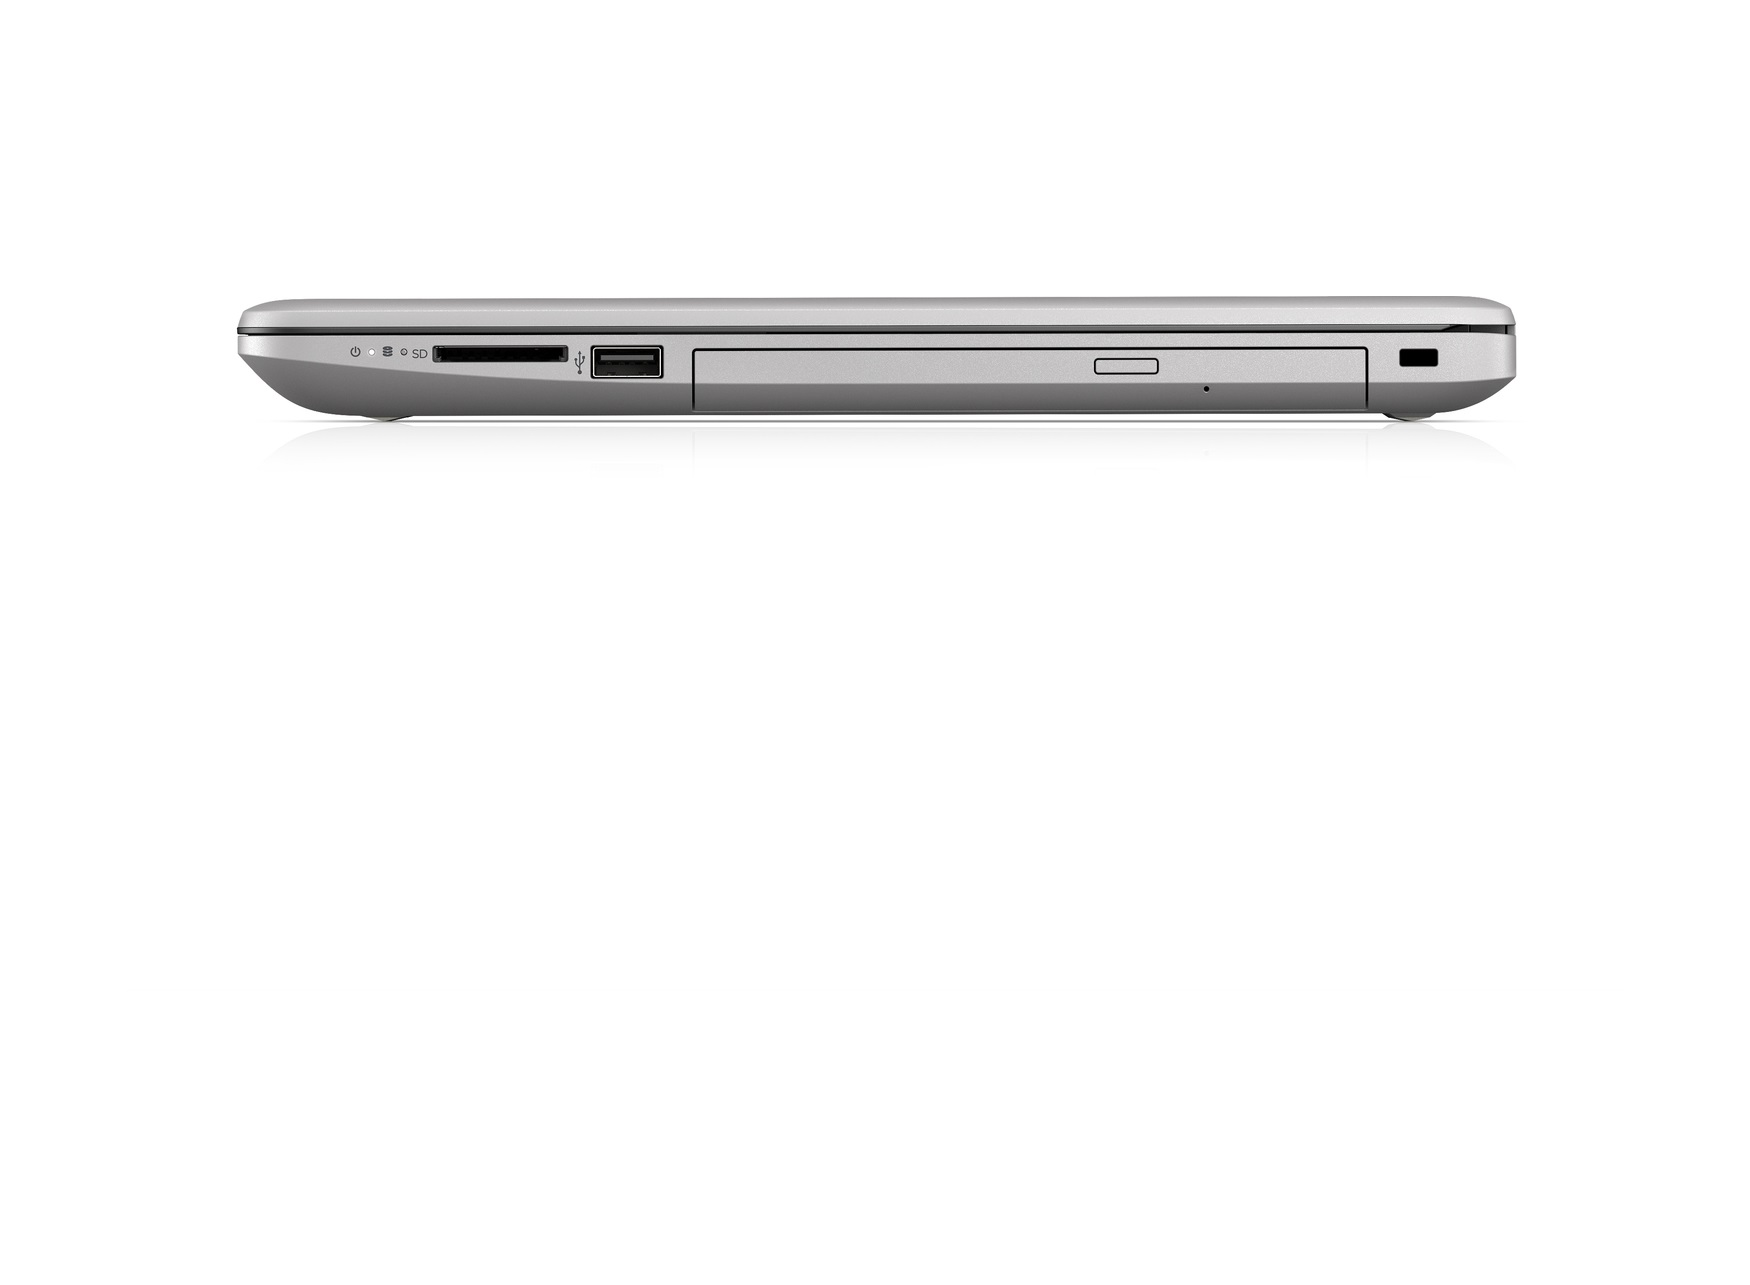 Notebook portatile HP 15,6 pollici intel i3-8130U 4gb ram 256gb ssd windows 10 foto 6